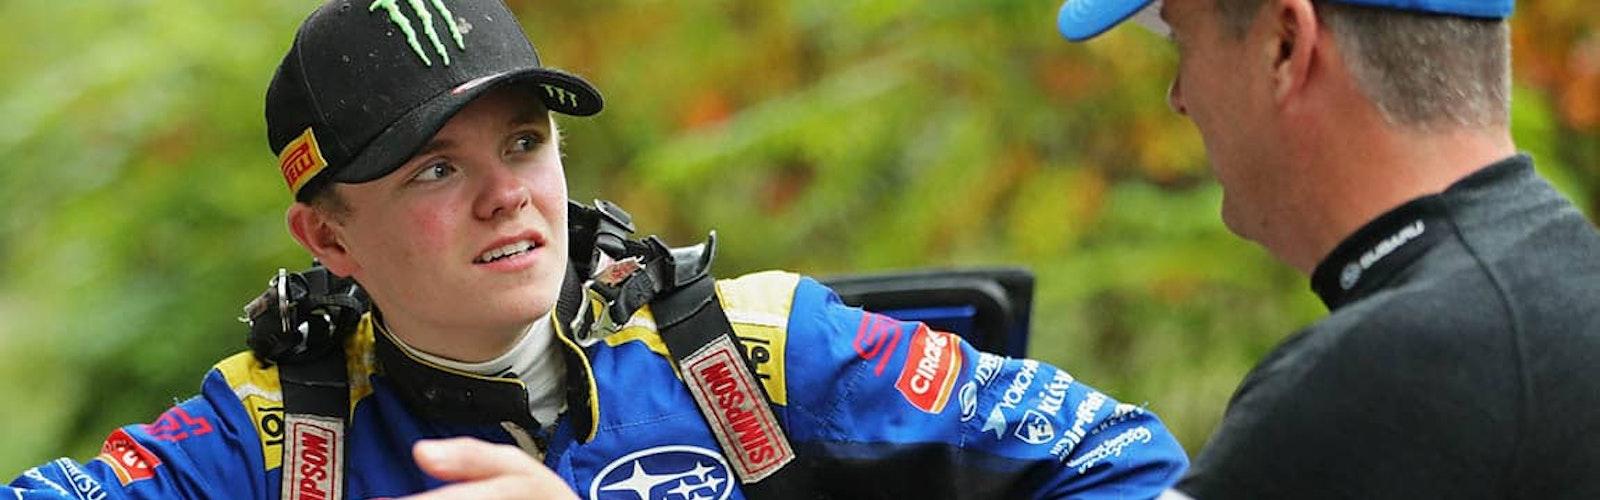 Oliver Solberg with Subaru Motorsports USA